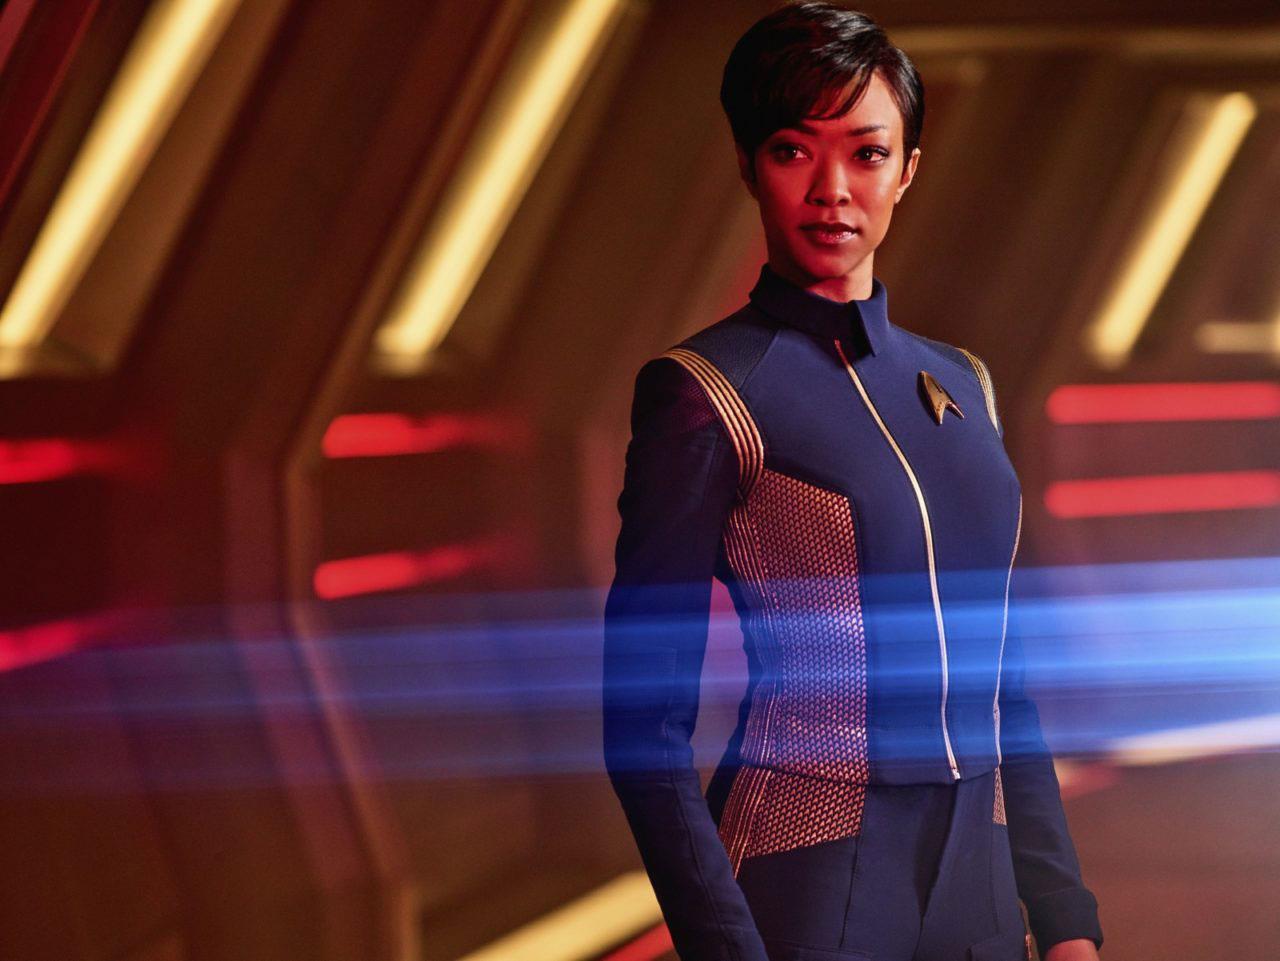 Una foto di scena di Sonequa Martin-Green sul set di Star Trek:Discovery